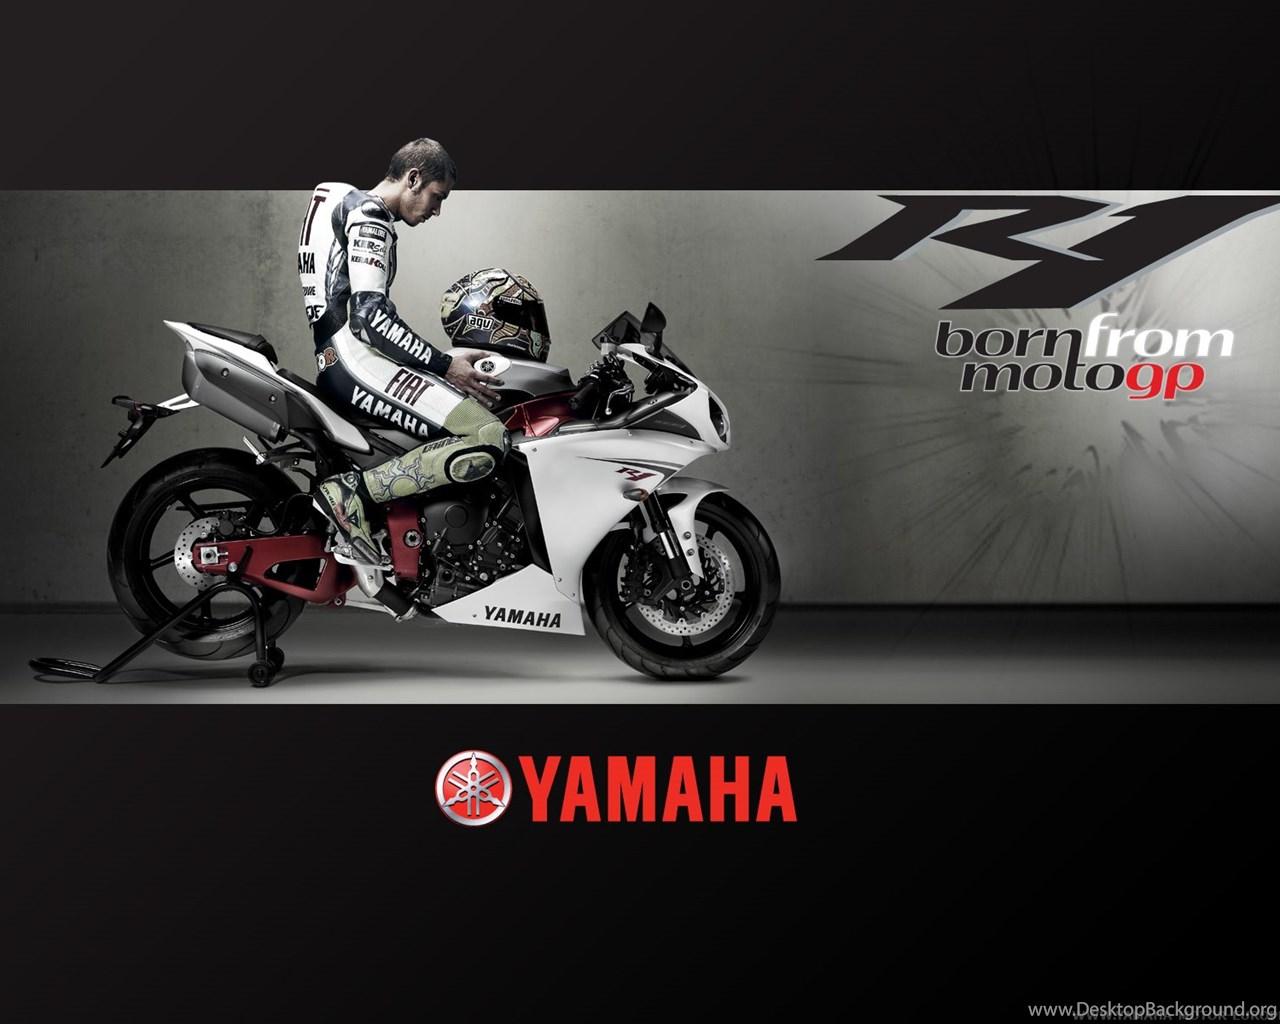 Unduh 680 Wallpaper Iphone Yamaha HD Paling Keren